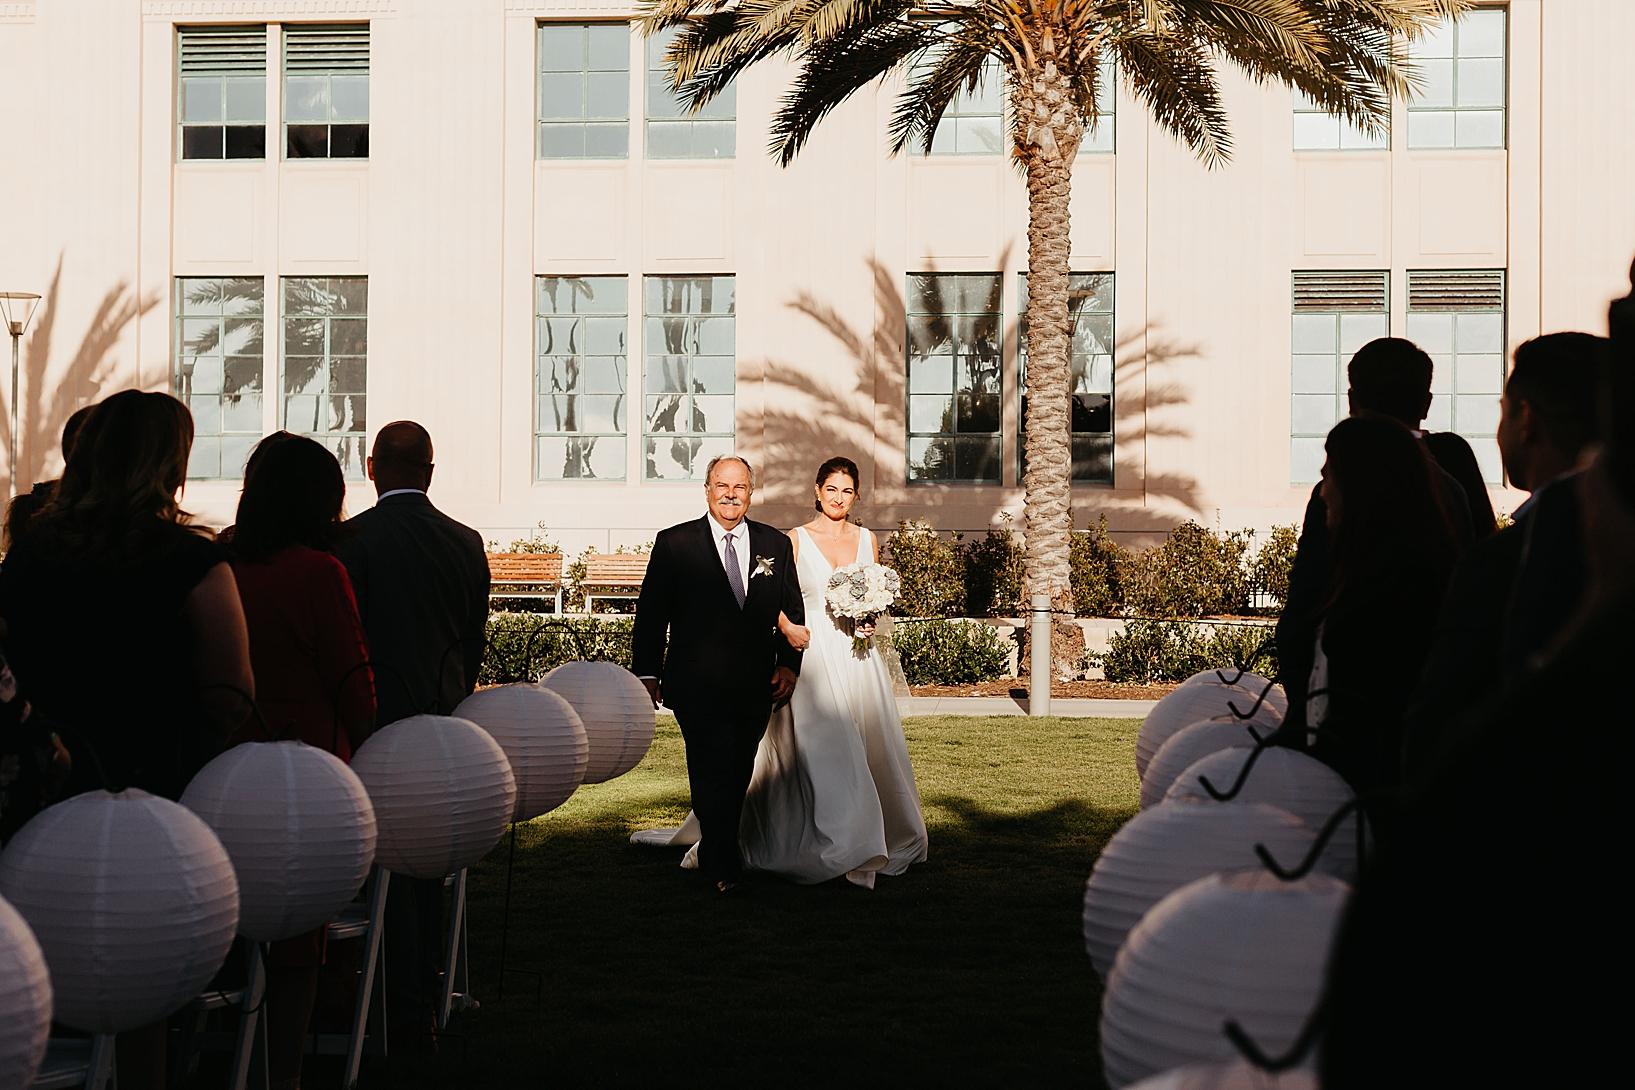 Herb-and-Wood-Wedding-34.jpg